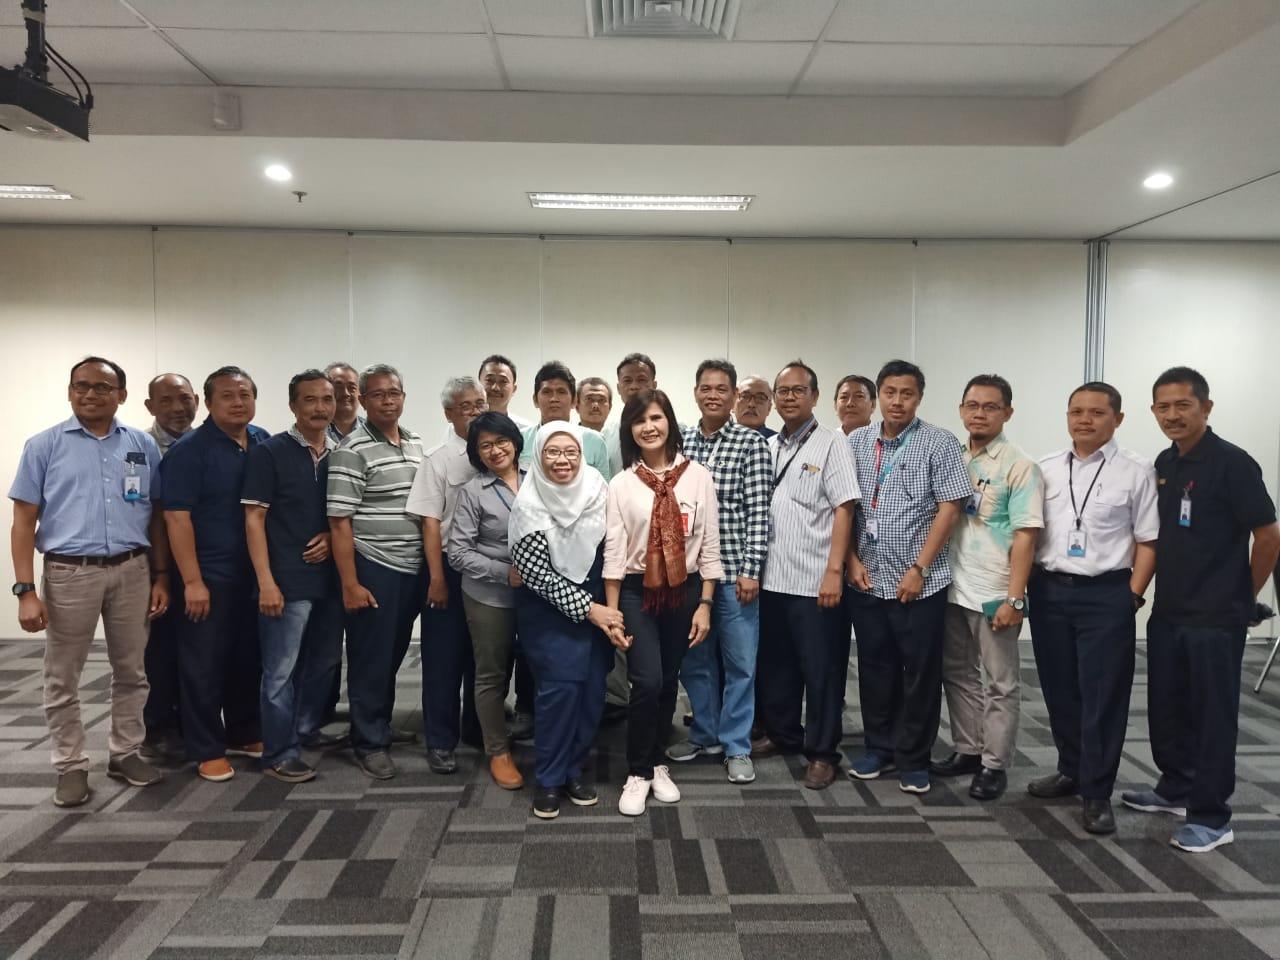 Sosialisasi di Mitra Pendiri PT. Garuda Maintenance Facility Aeroasia Tbk., Tanggal 04 Oktober 2019